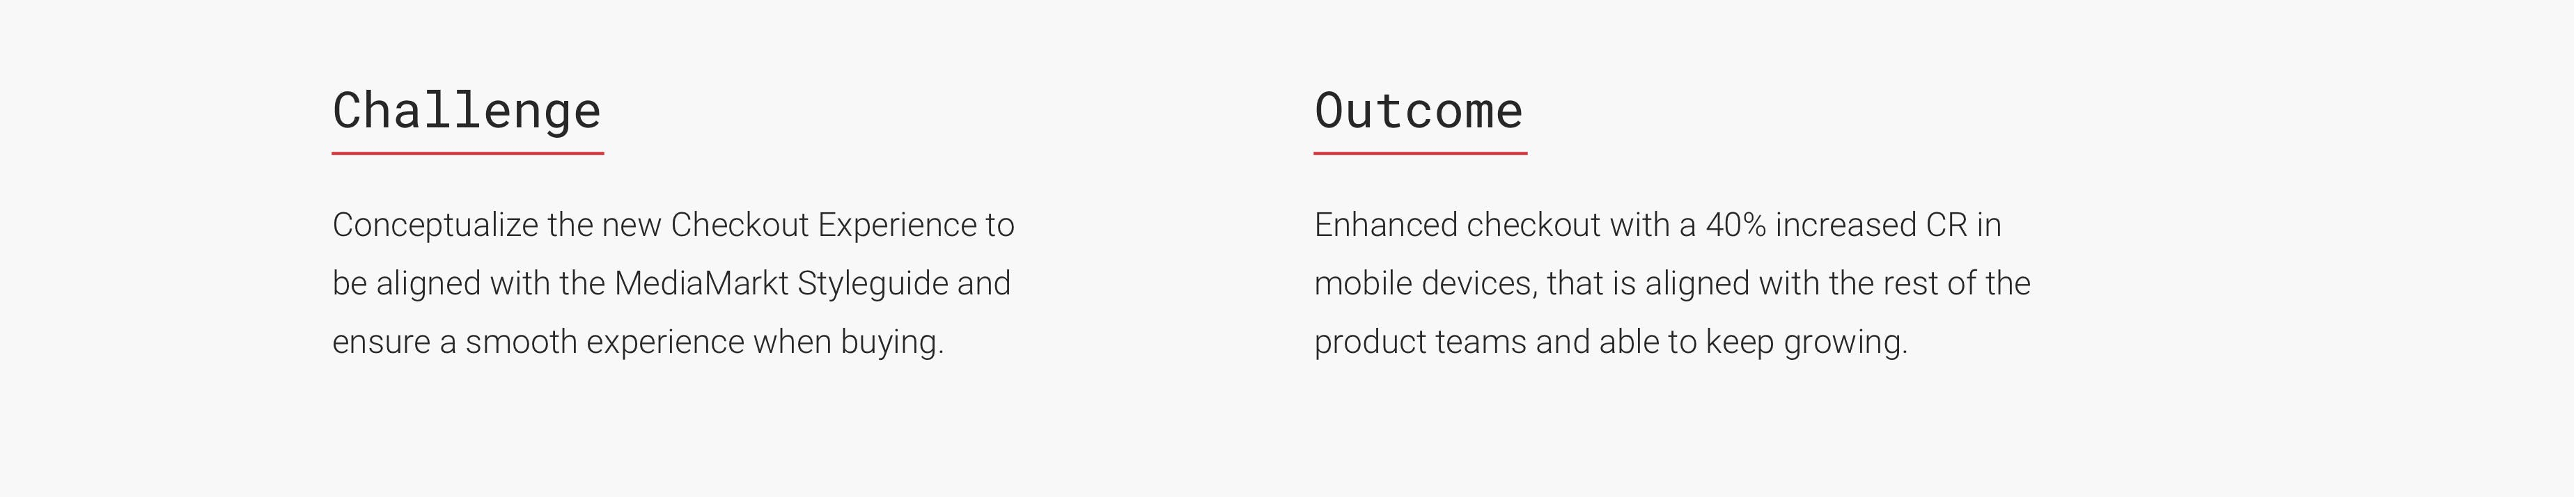 Challenge & Outcome of MediaMarkt project - by metakitrina.fun